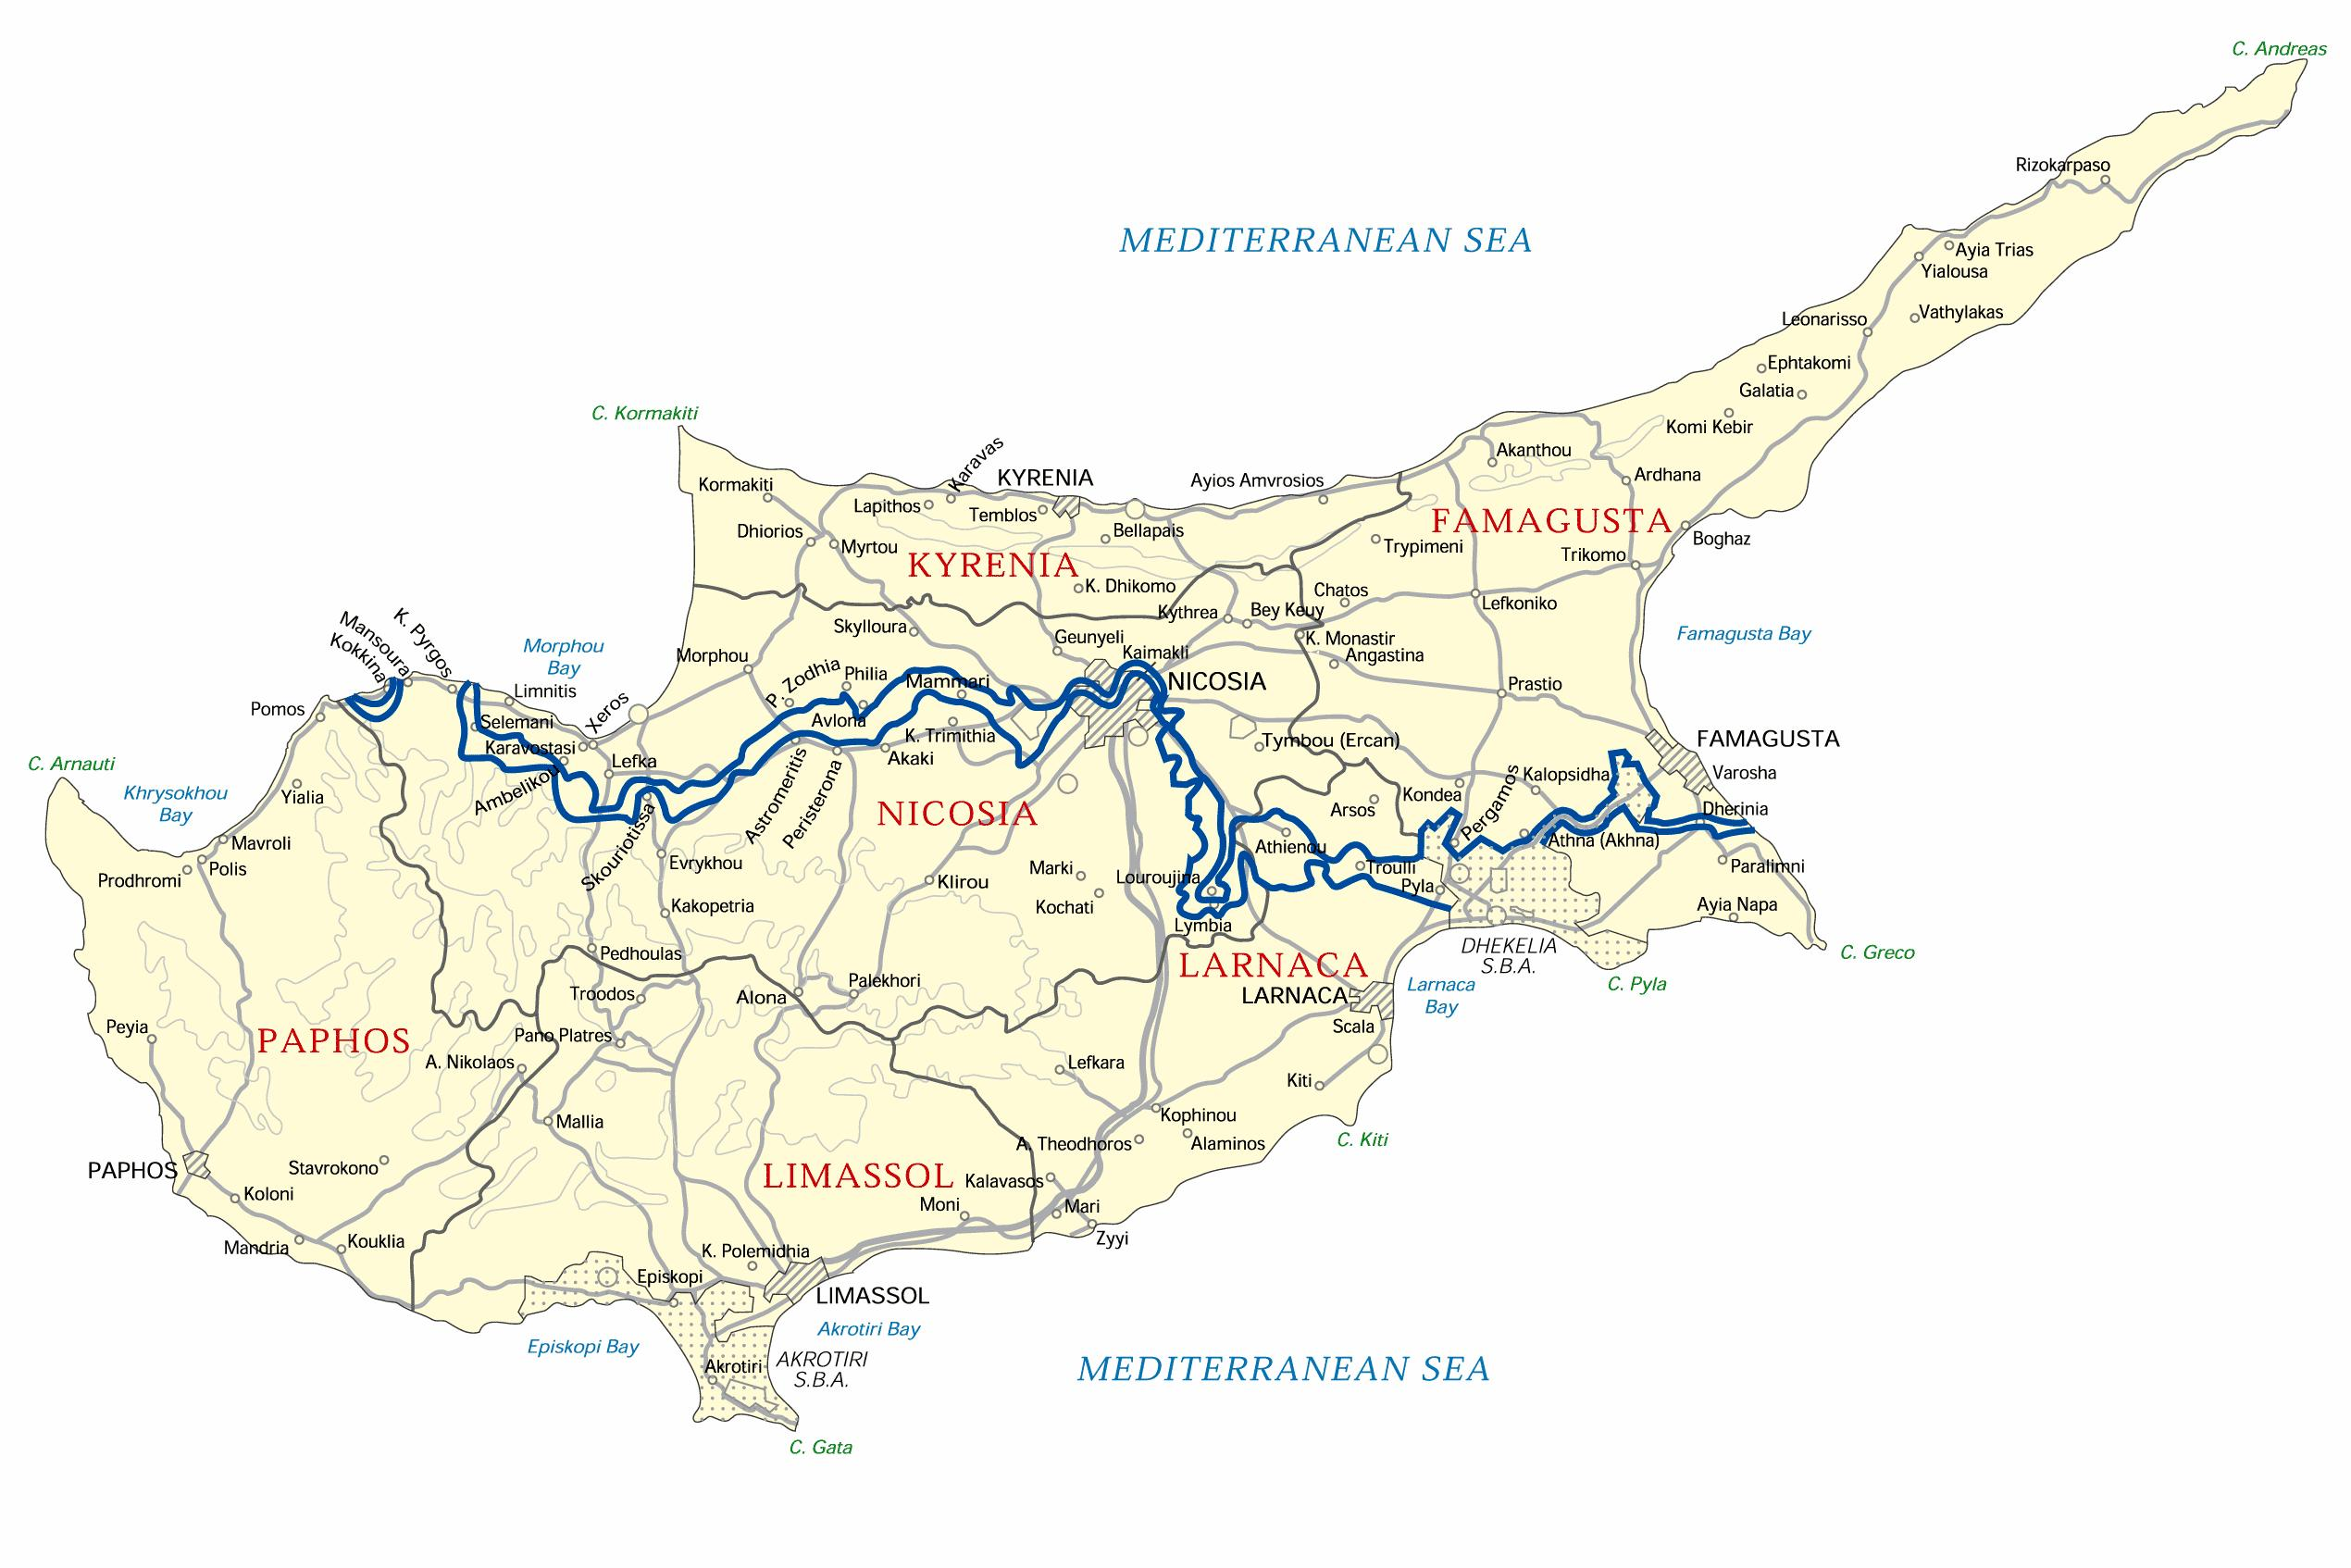 Cypern Offline Karta Karta Over Cypern Offline Sodra Europa